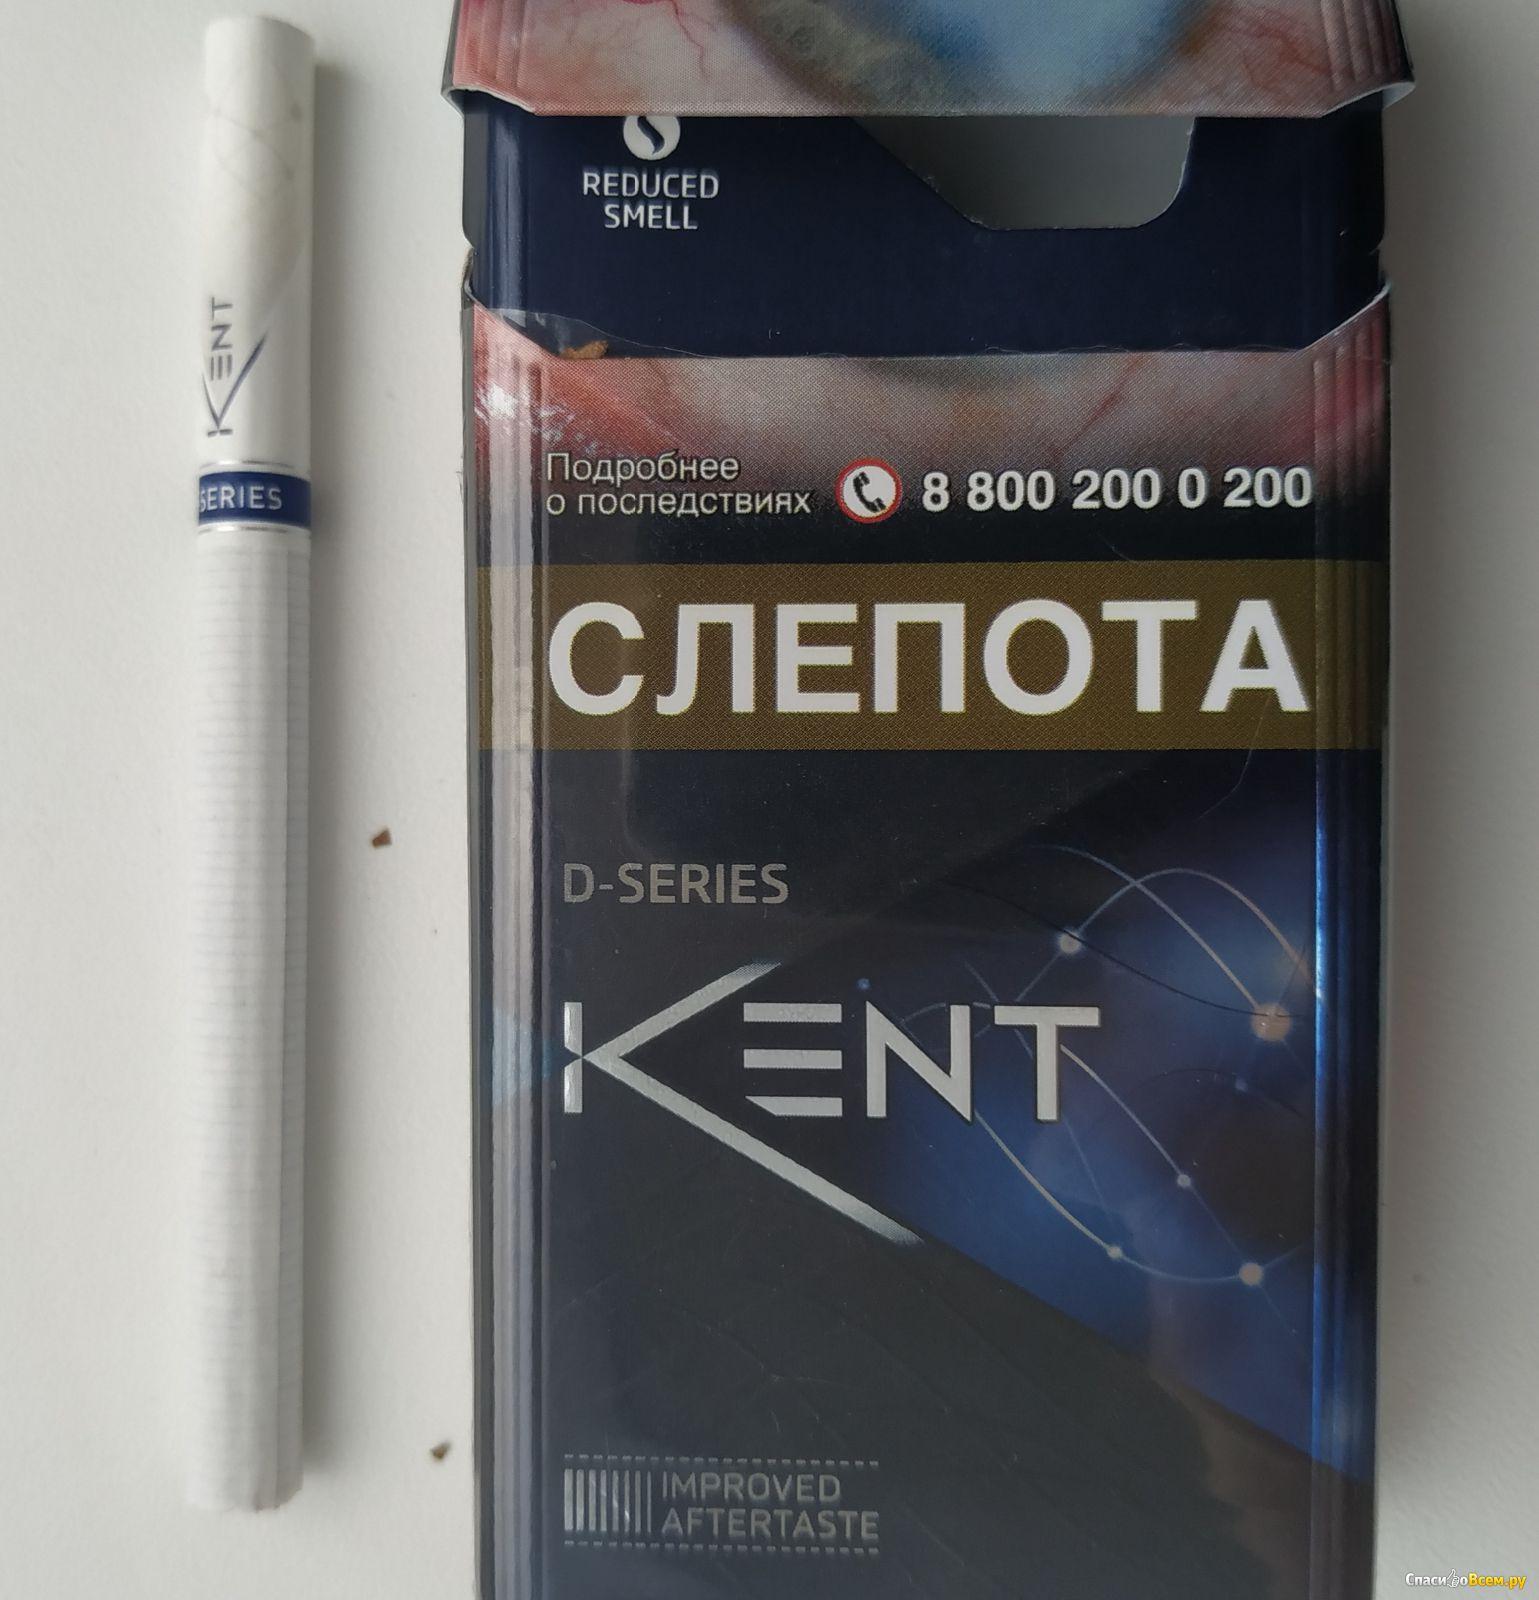 Куплю сигареты кент сигареты оптом по интернету